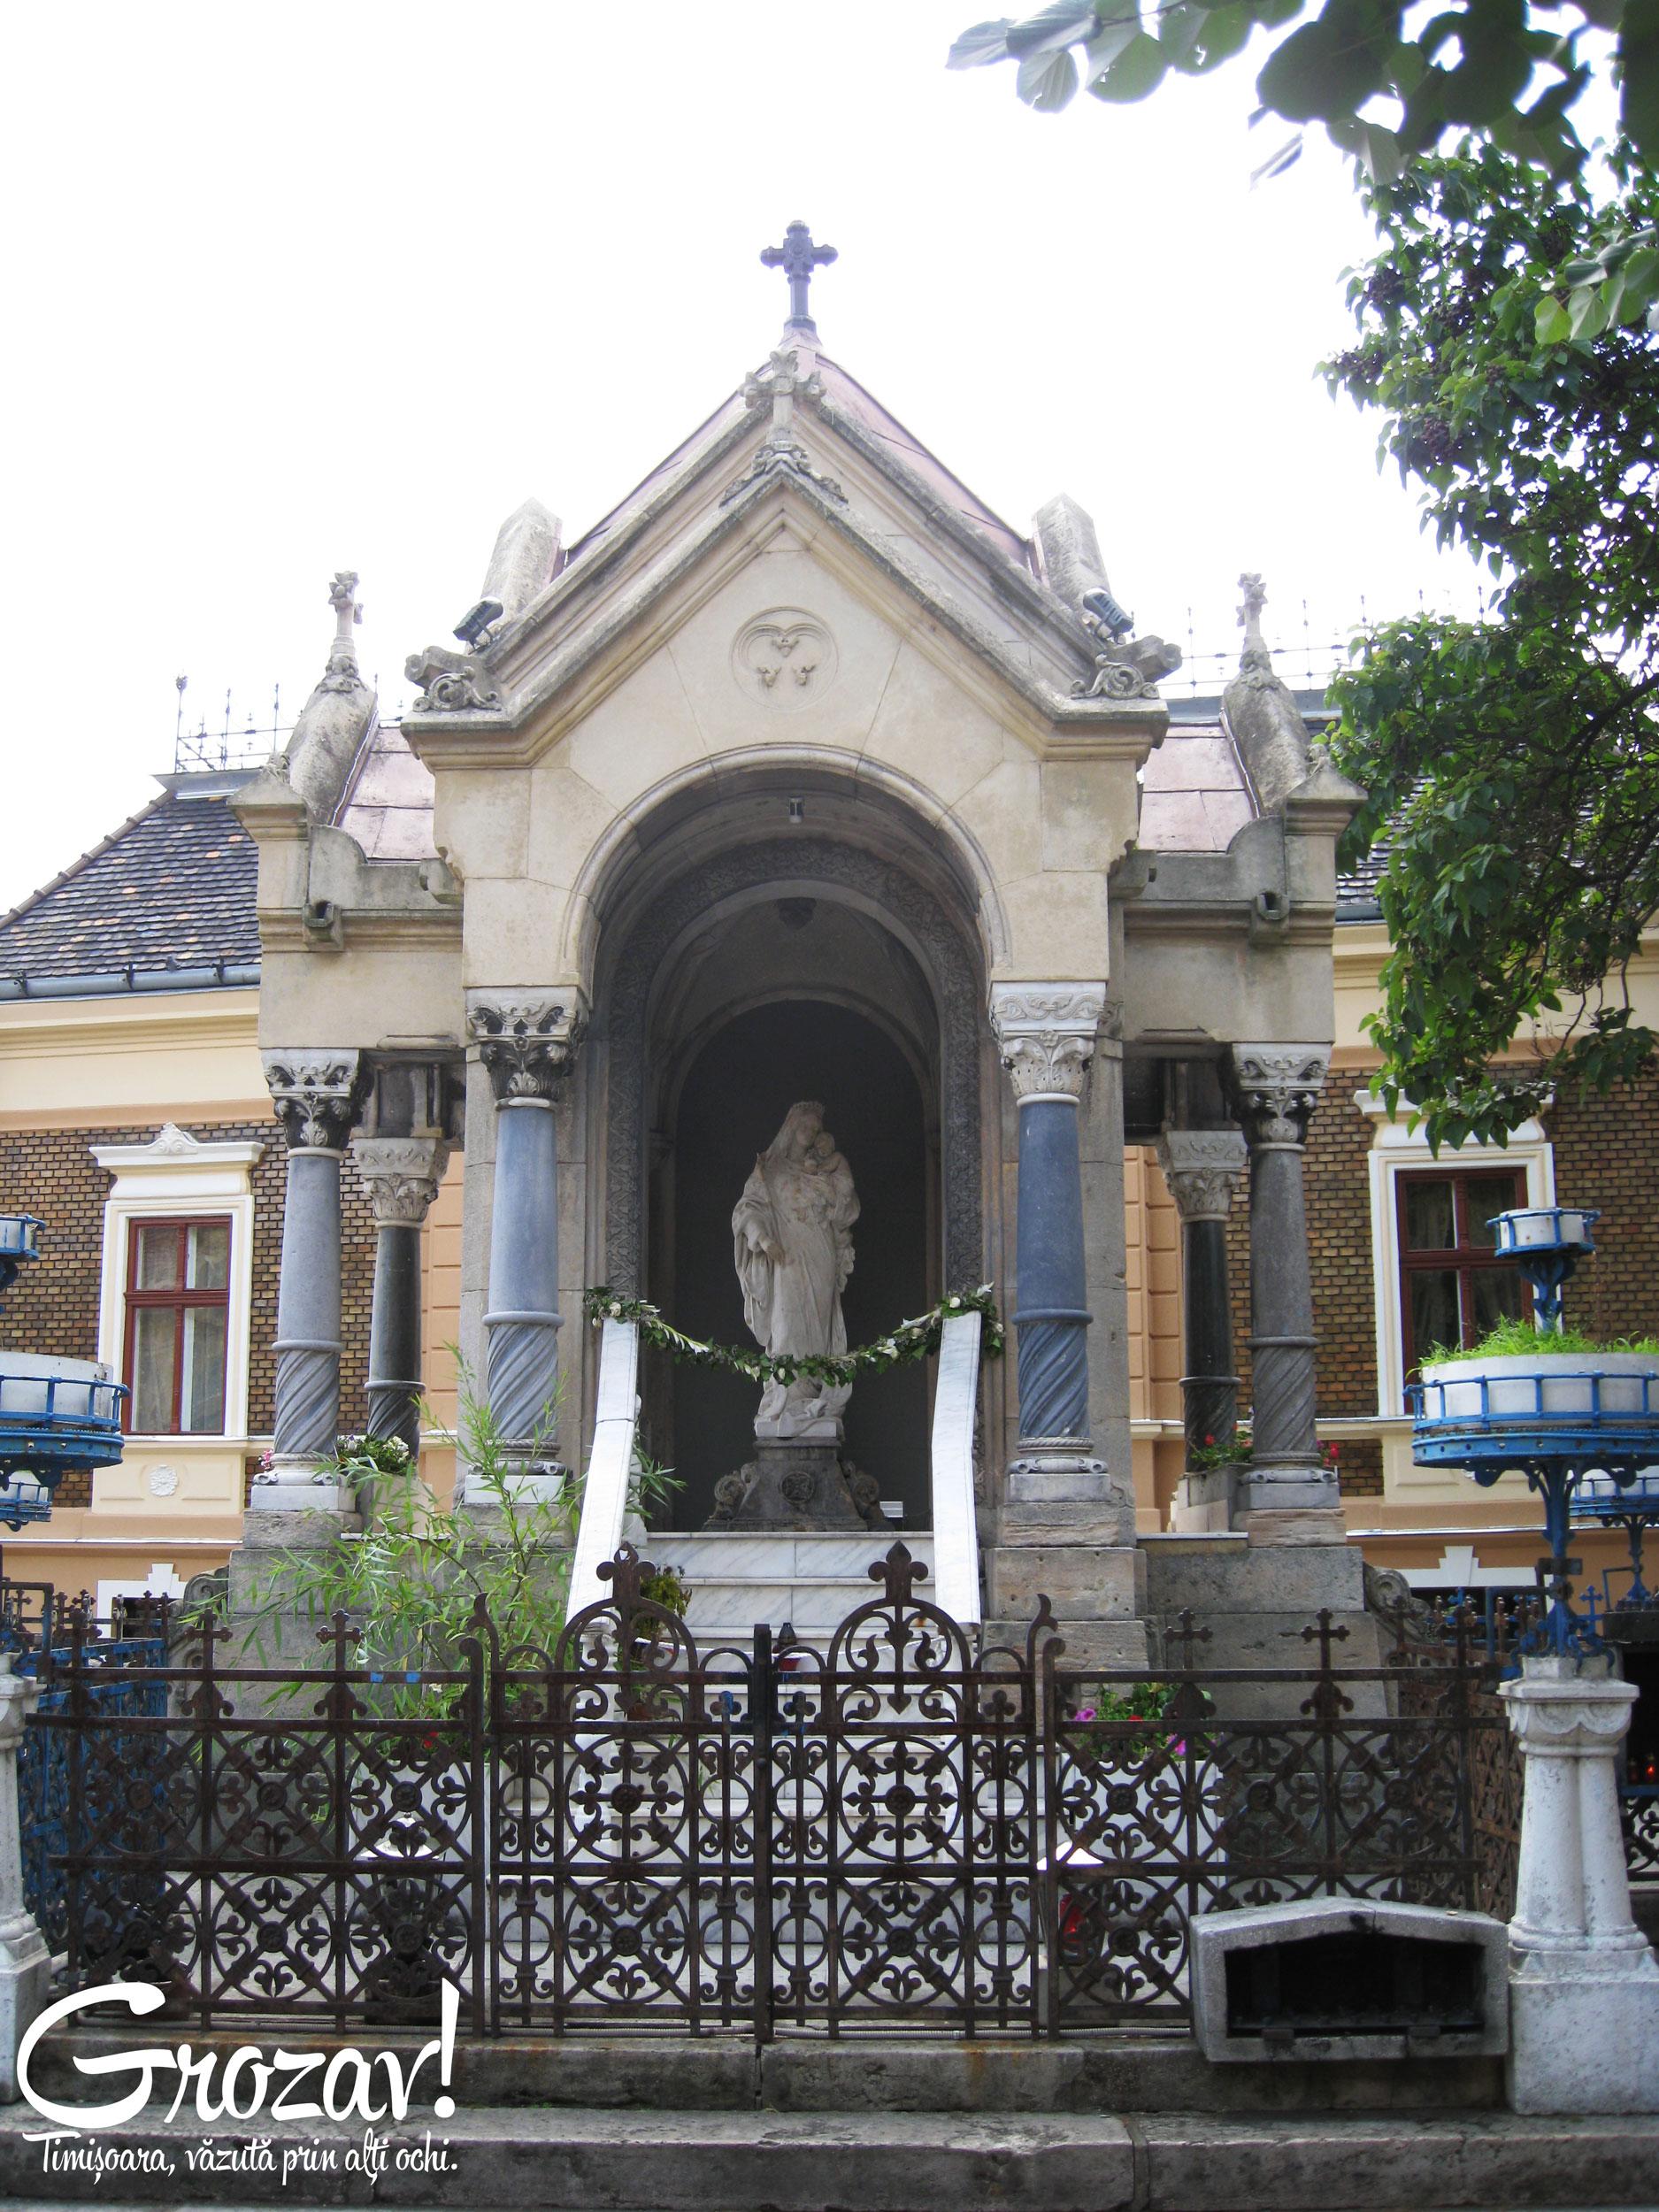 Statuie-Piata-Maria-Timisoara---grozav.org